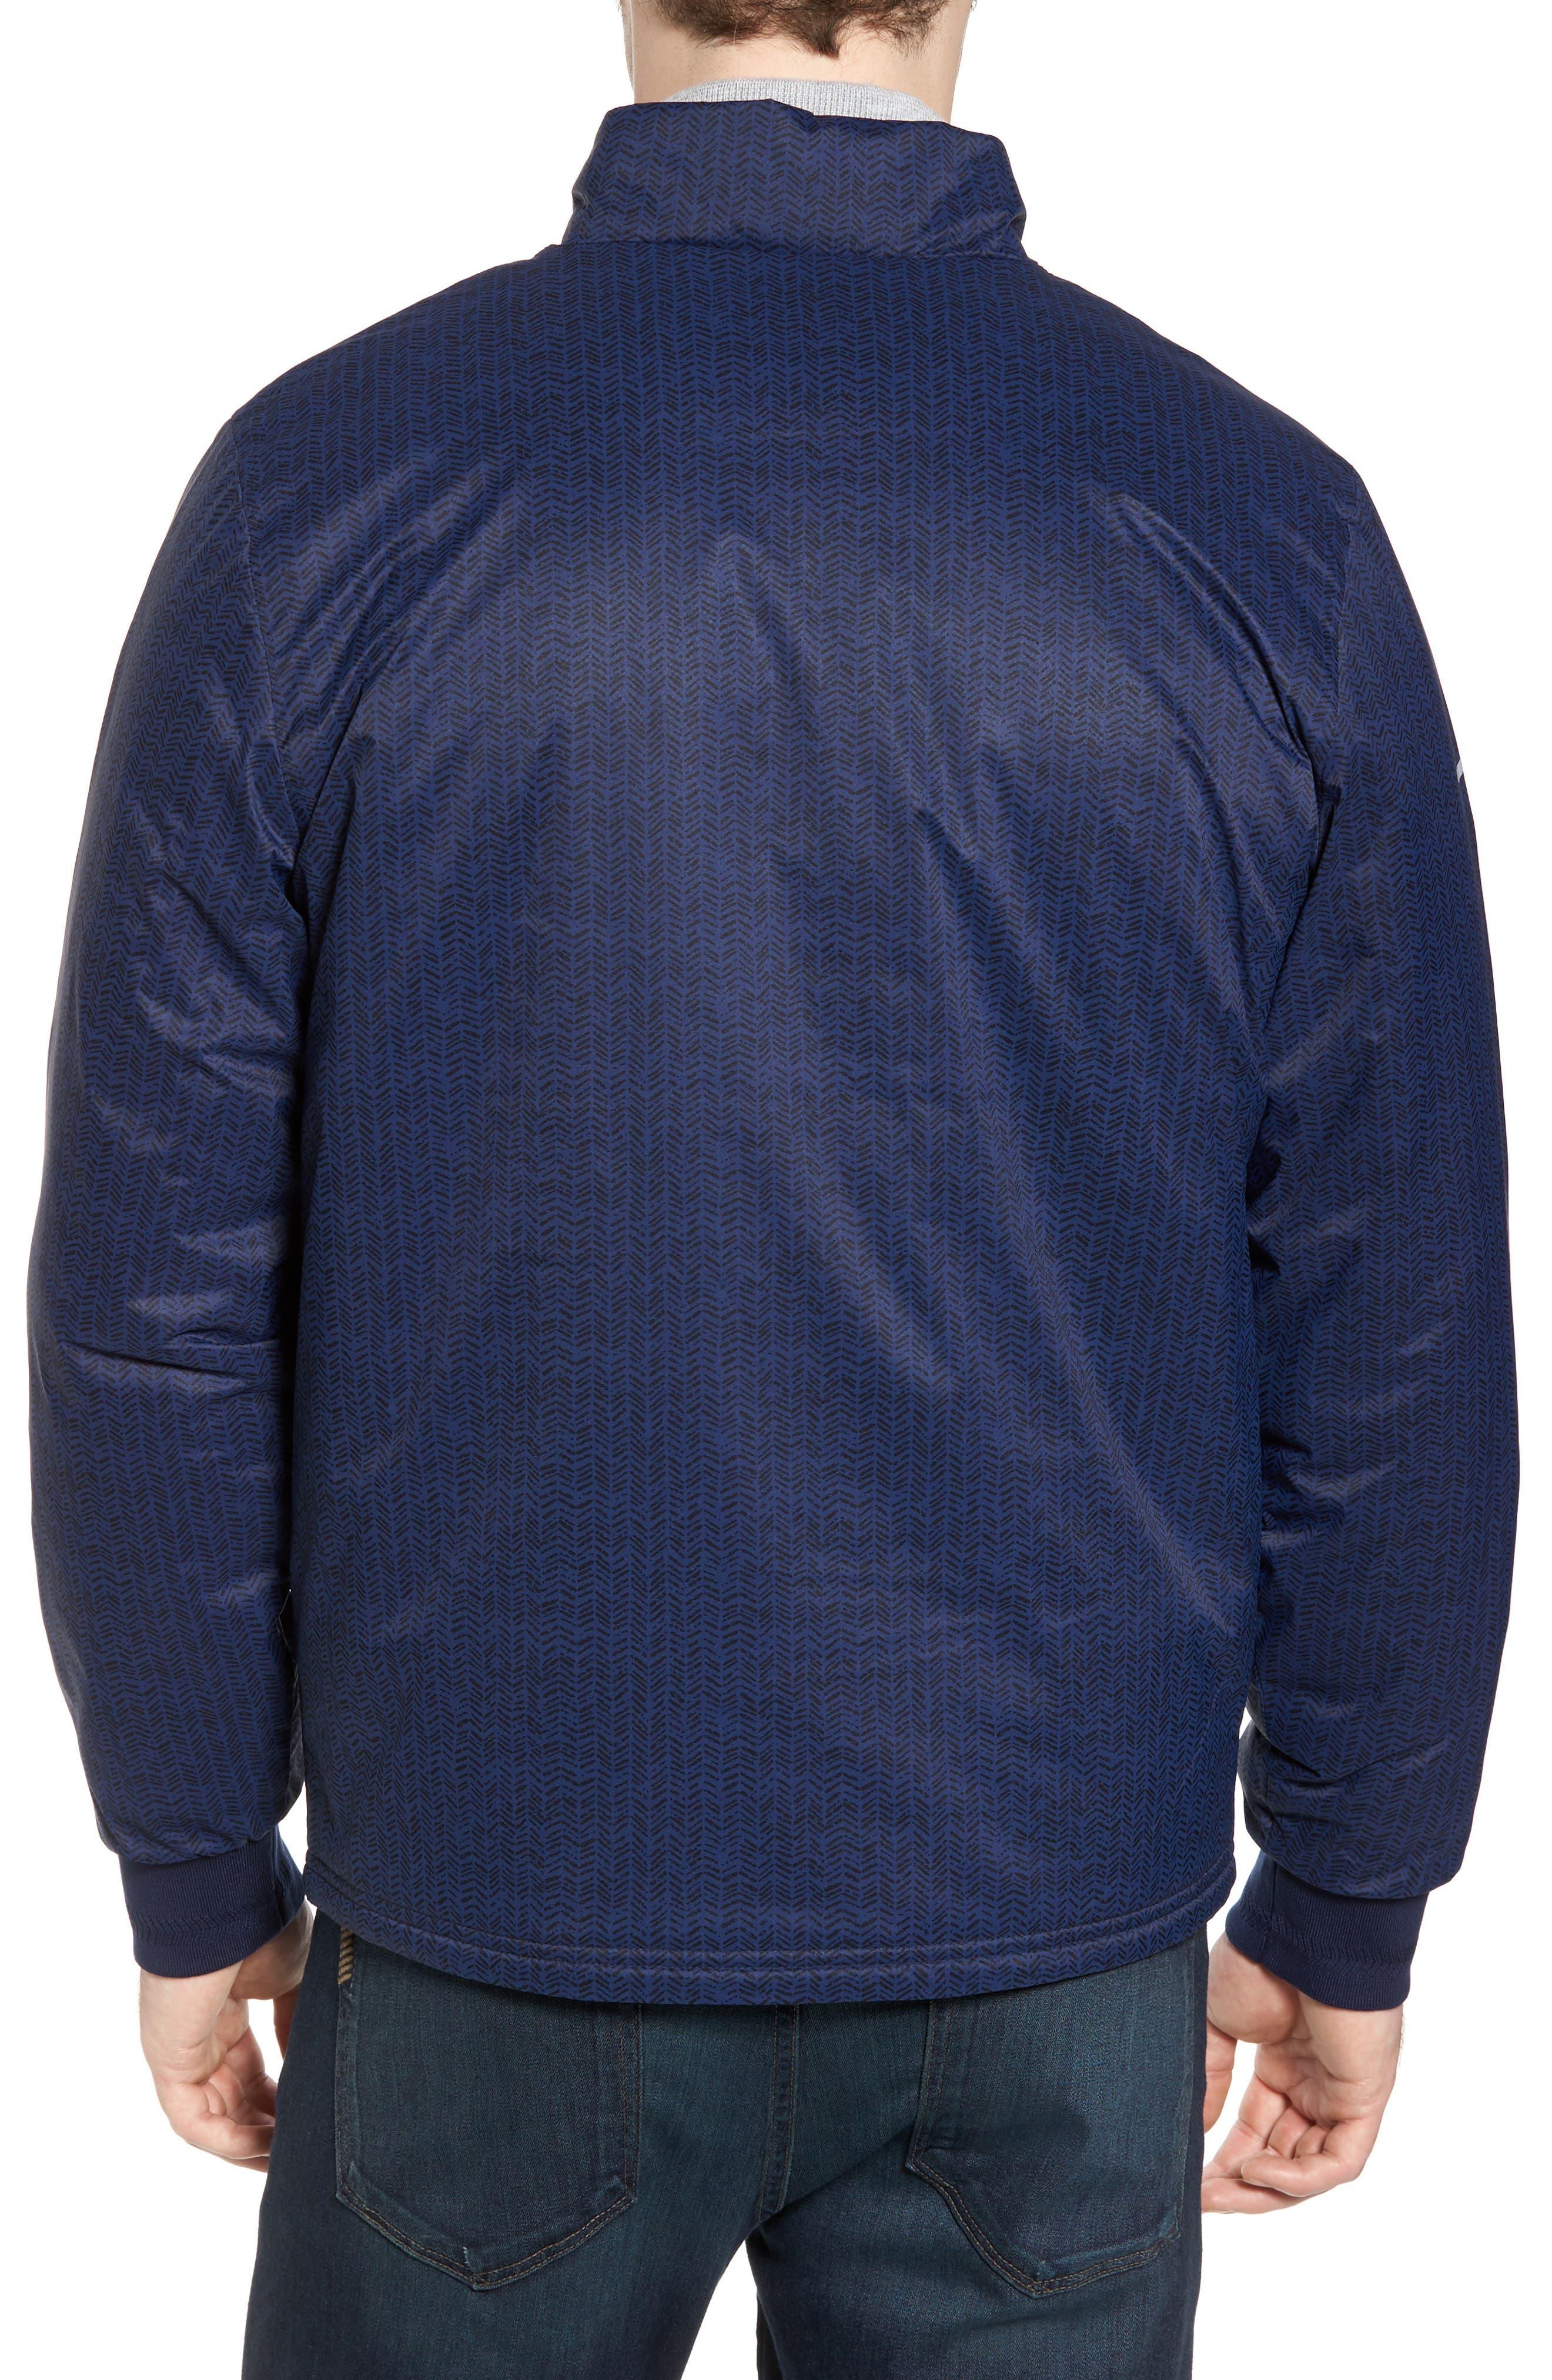 Herringbone Zip-Up Jacket,                             Alternate thumbnail 2, color,                             Navy Blue/ Navy Blue